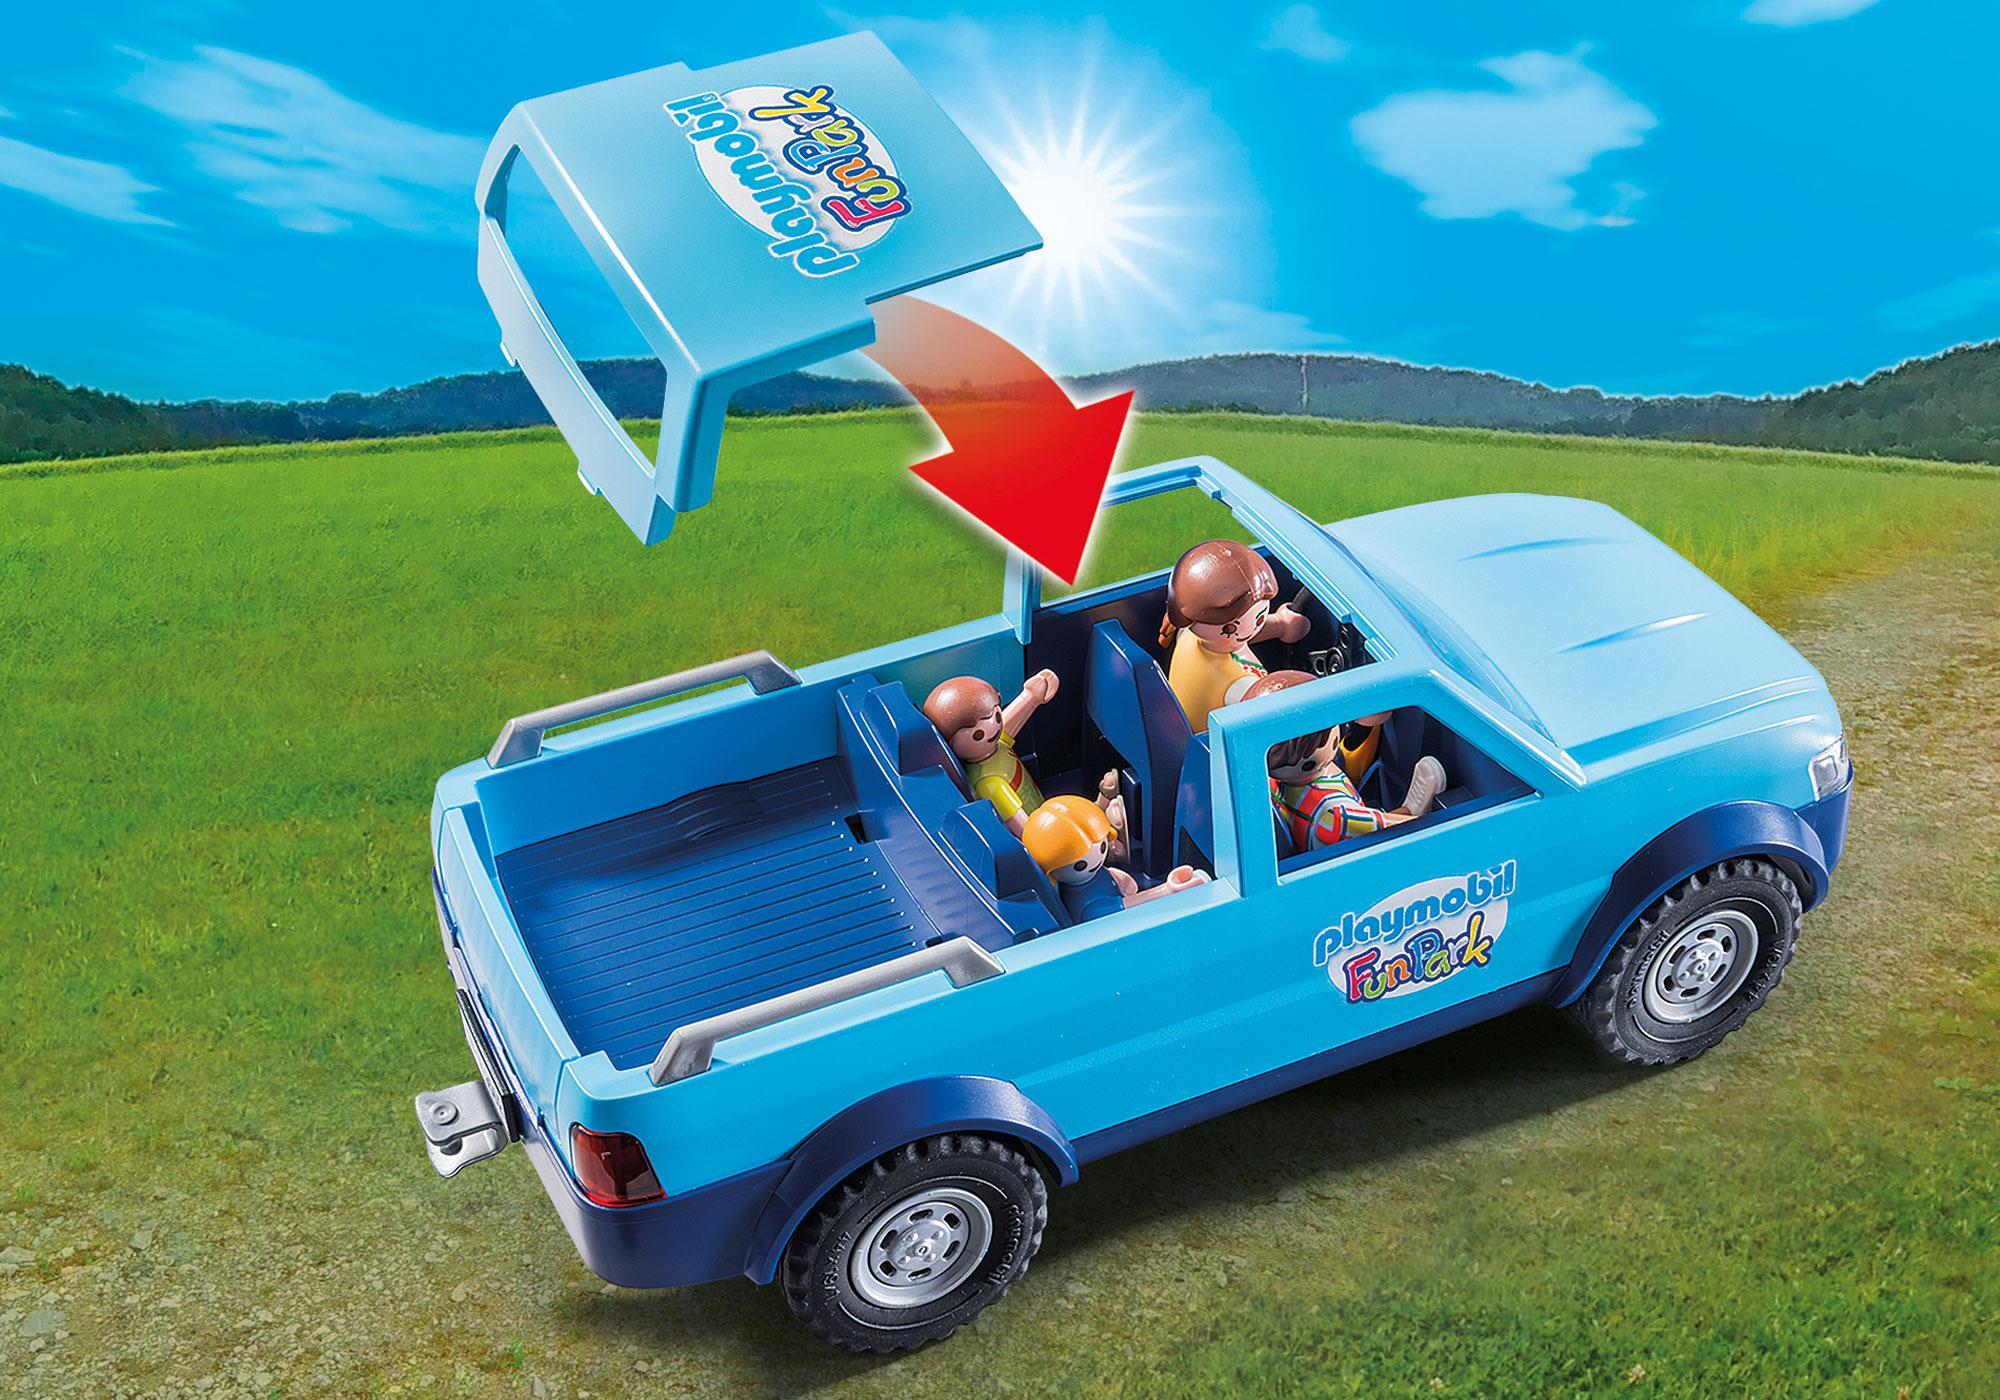 http://media.playmobil.com/i/playmobil/9502_product_extra1/Playmobil-Pick-Up mit Wohnwagen